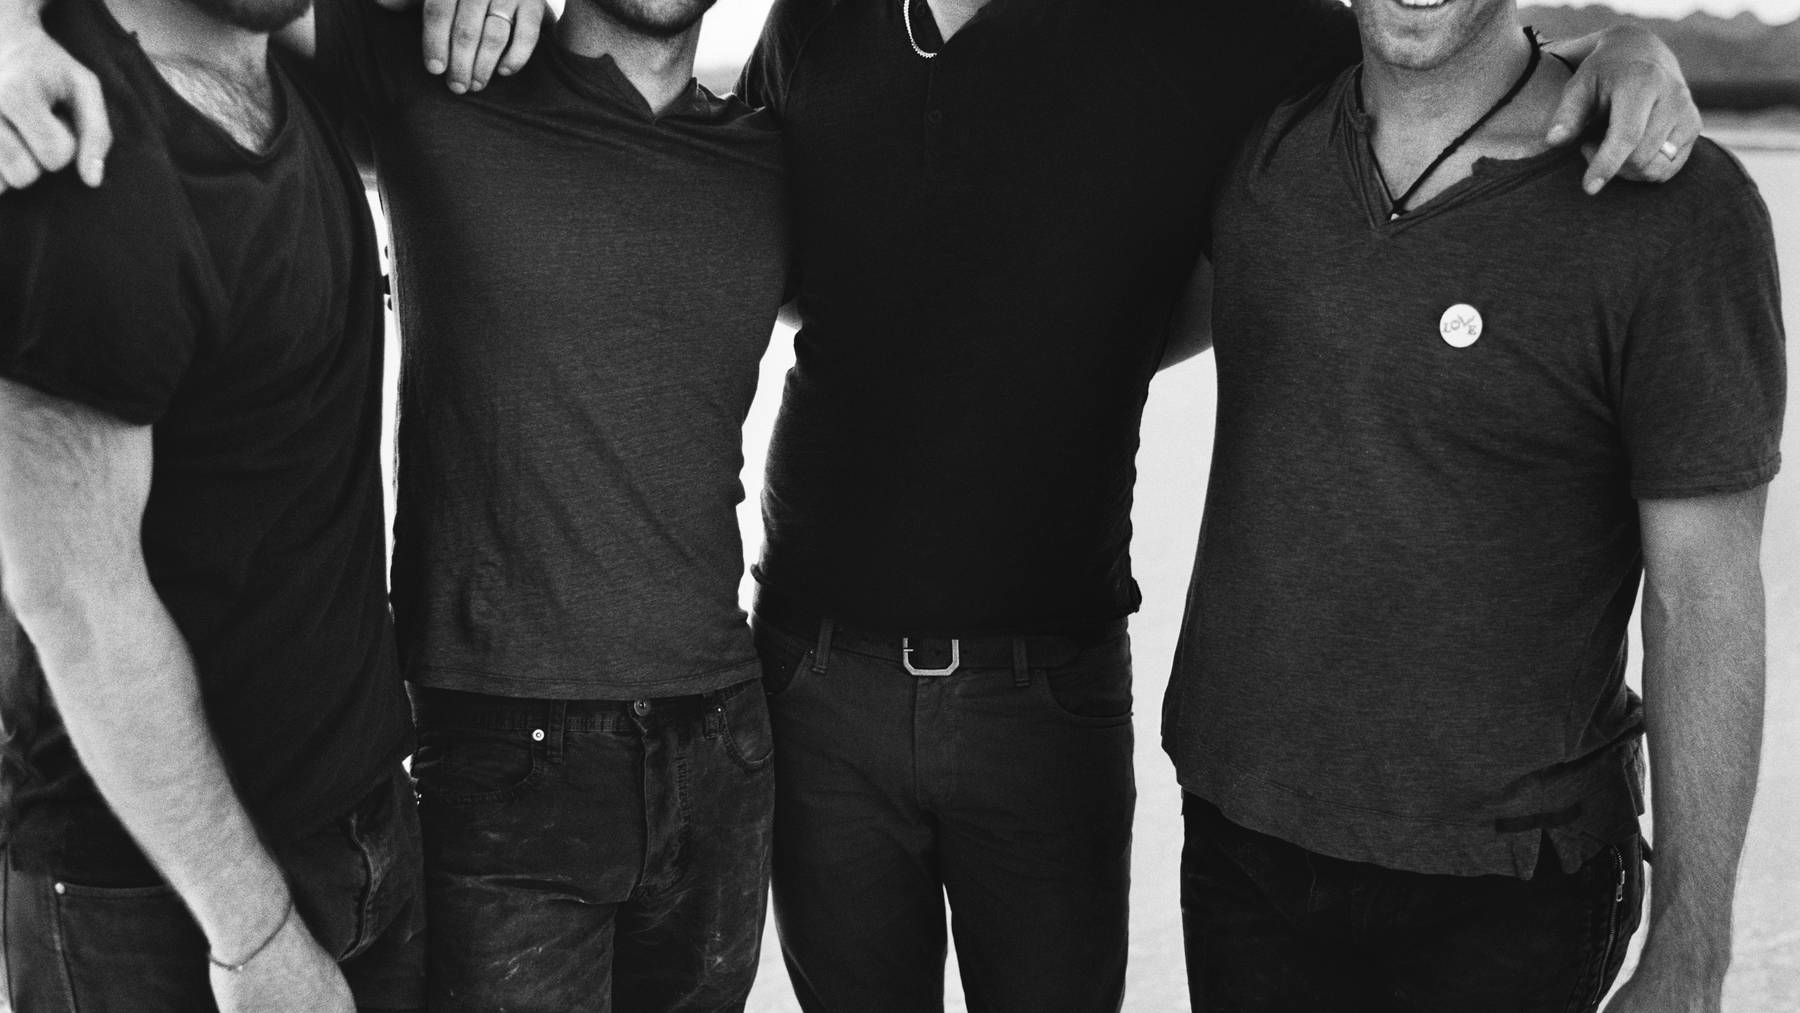 Das Album «A Head Full Of Dreams» bereitete Coldplay viel Spass